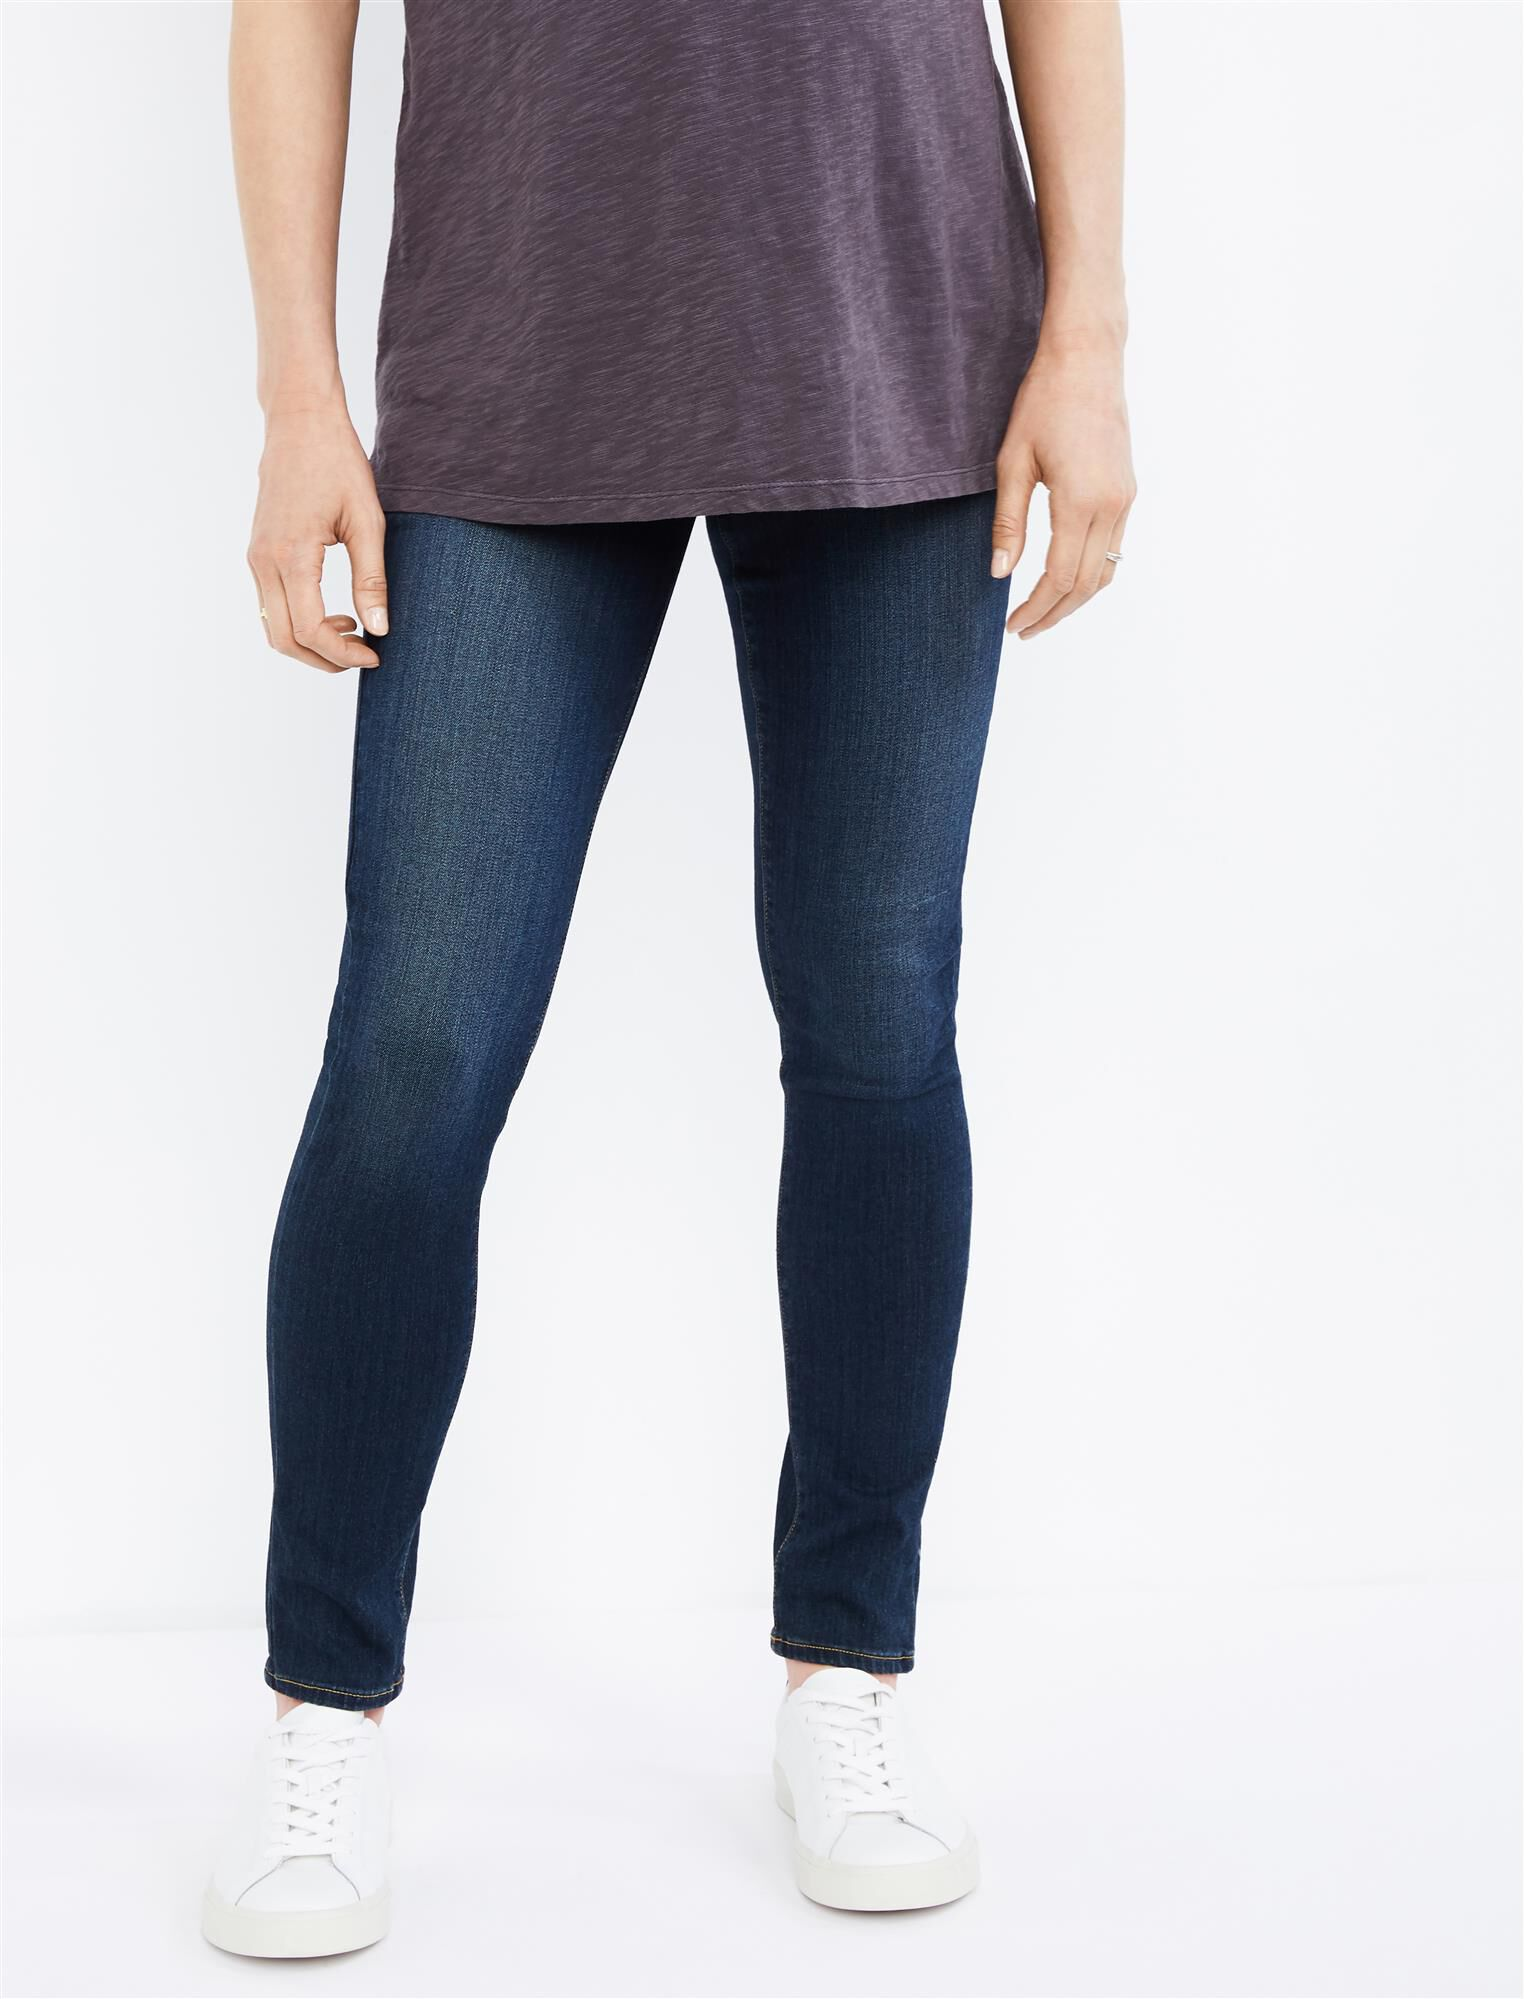 Paige Side Panel Verdugo Ultra Skinny Maternity Jeans